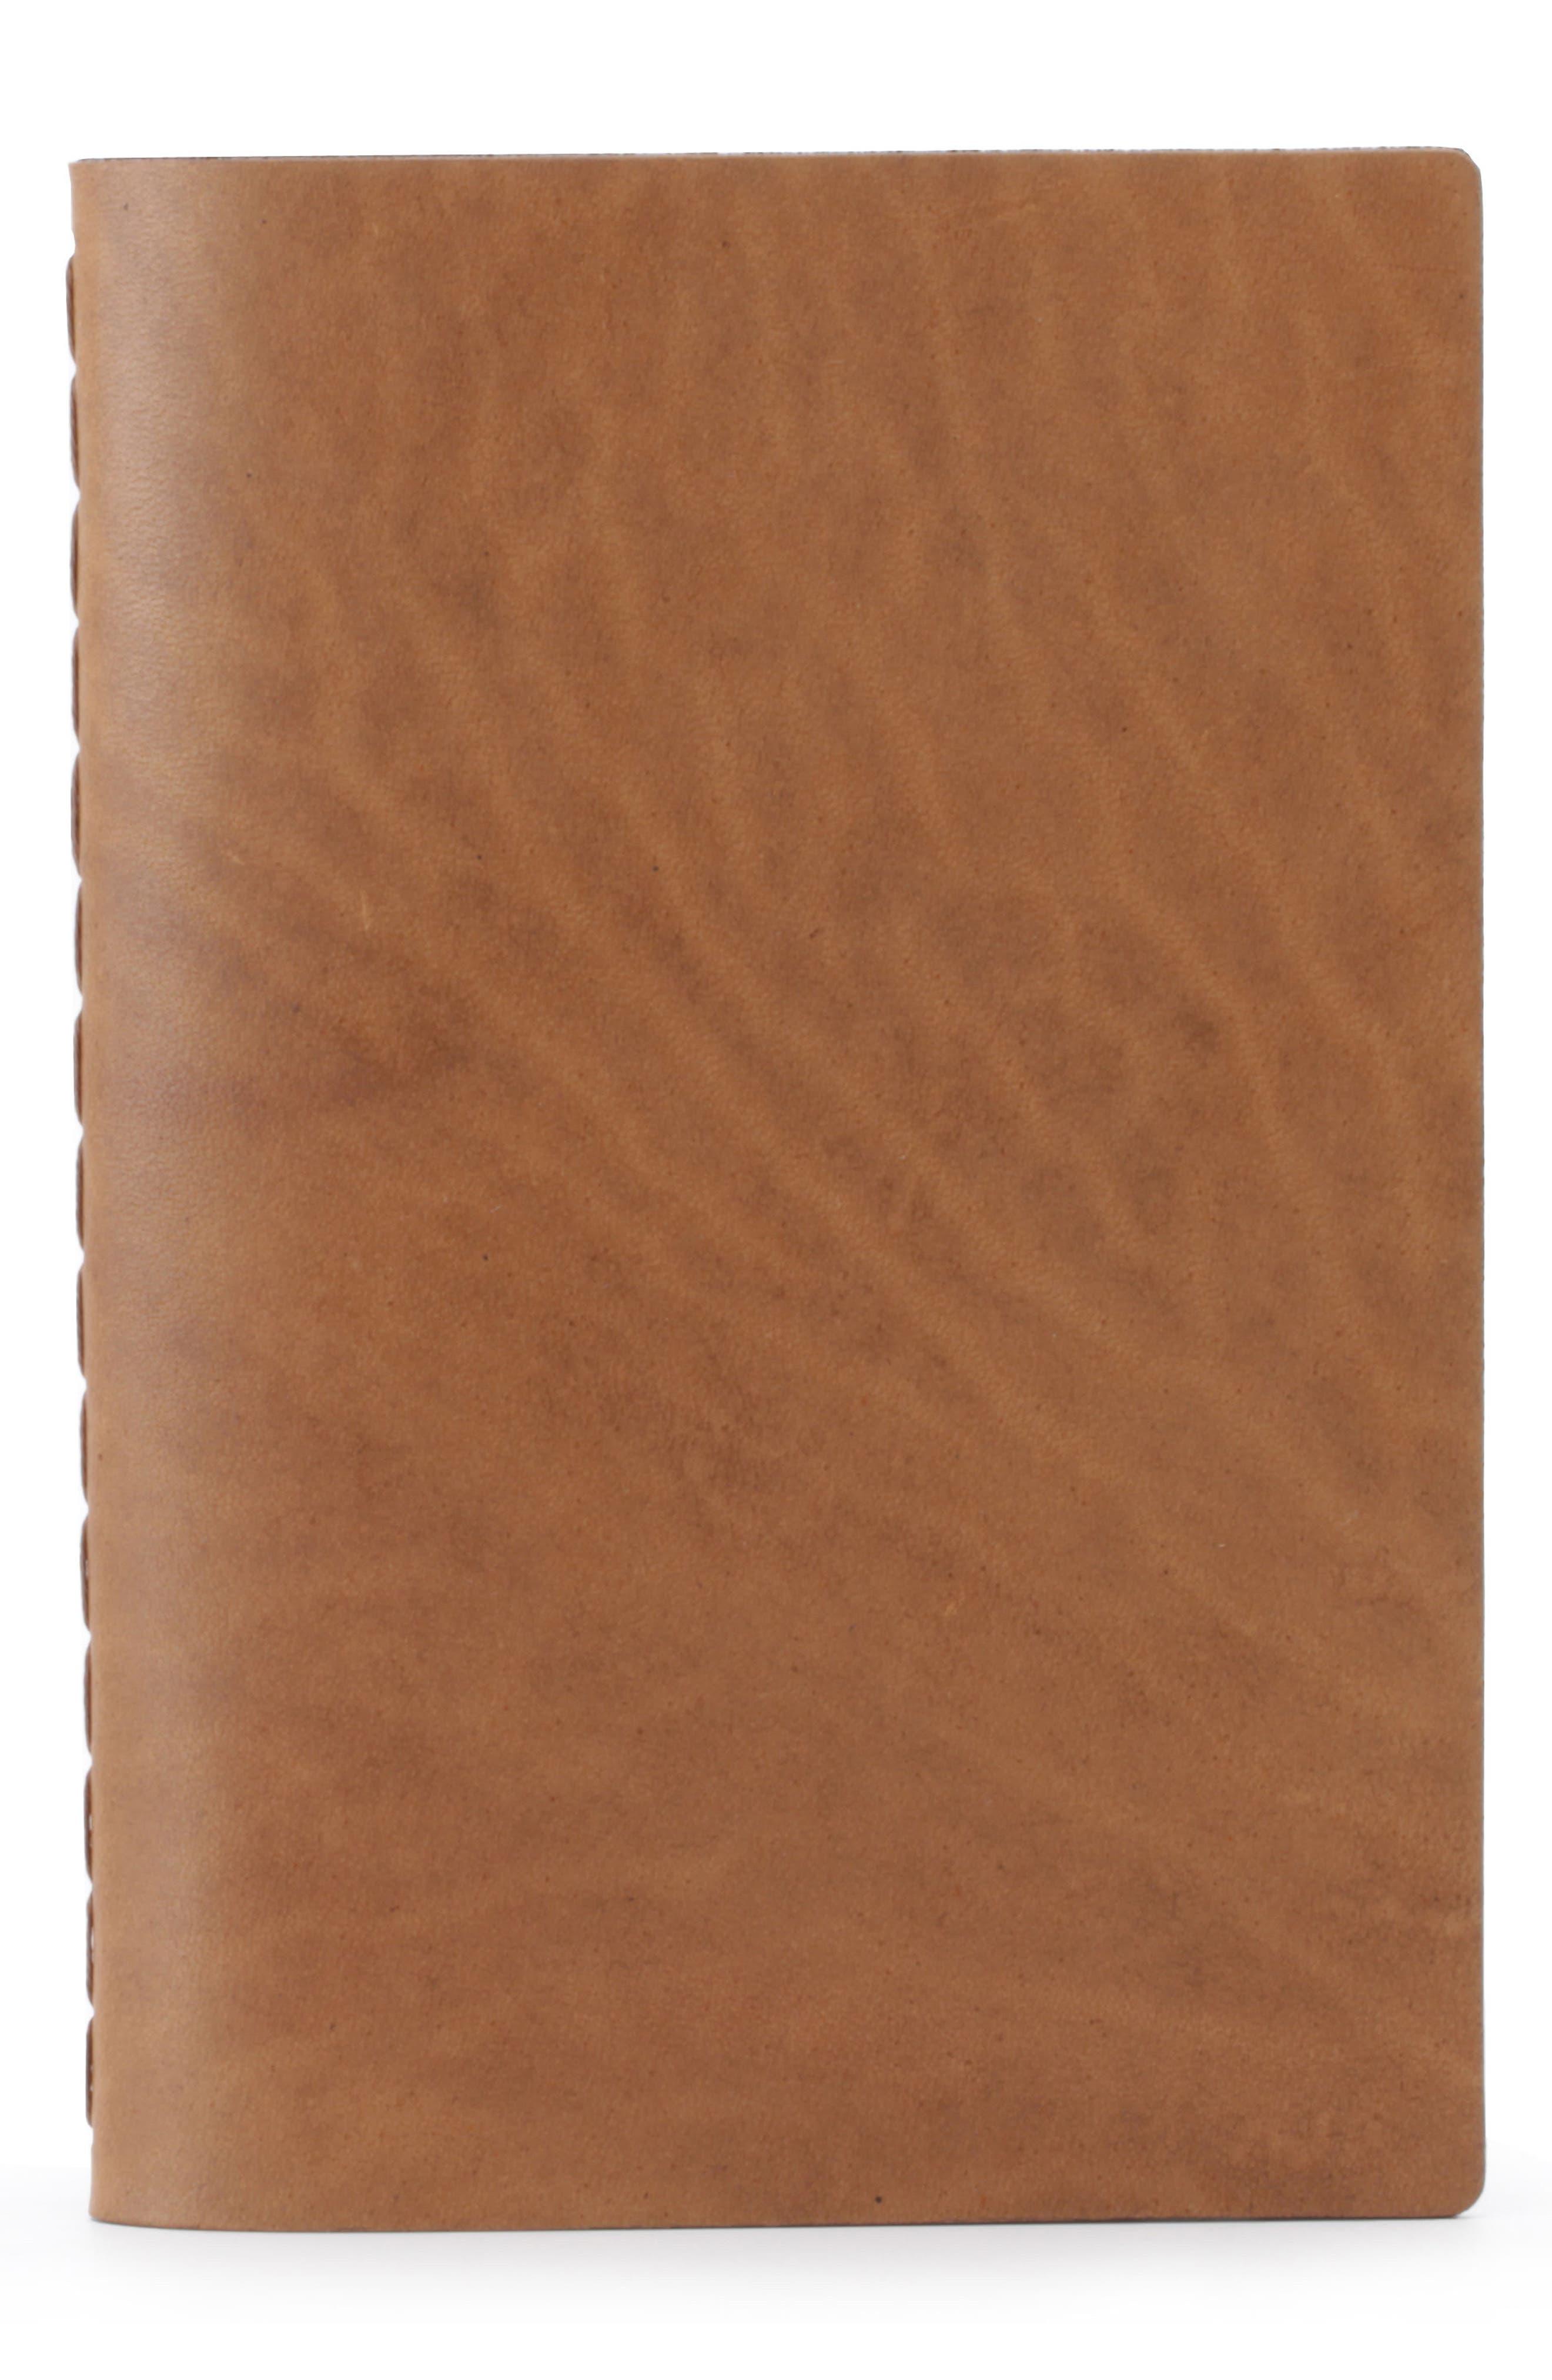 Ezra Arthur Medium Leather Notebook